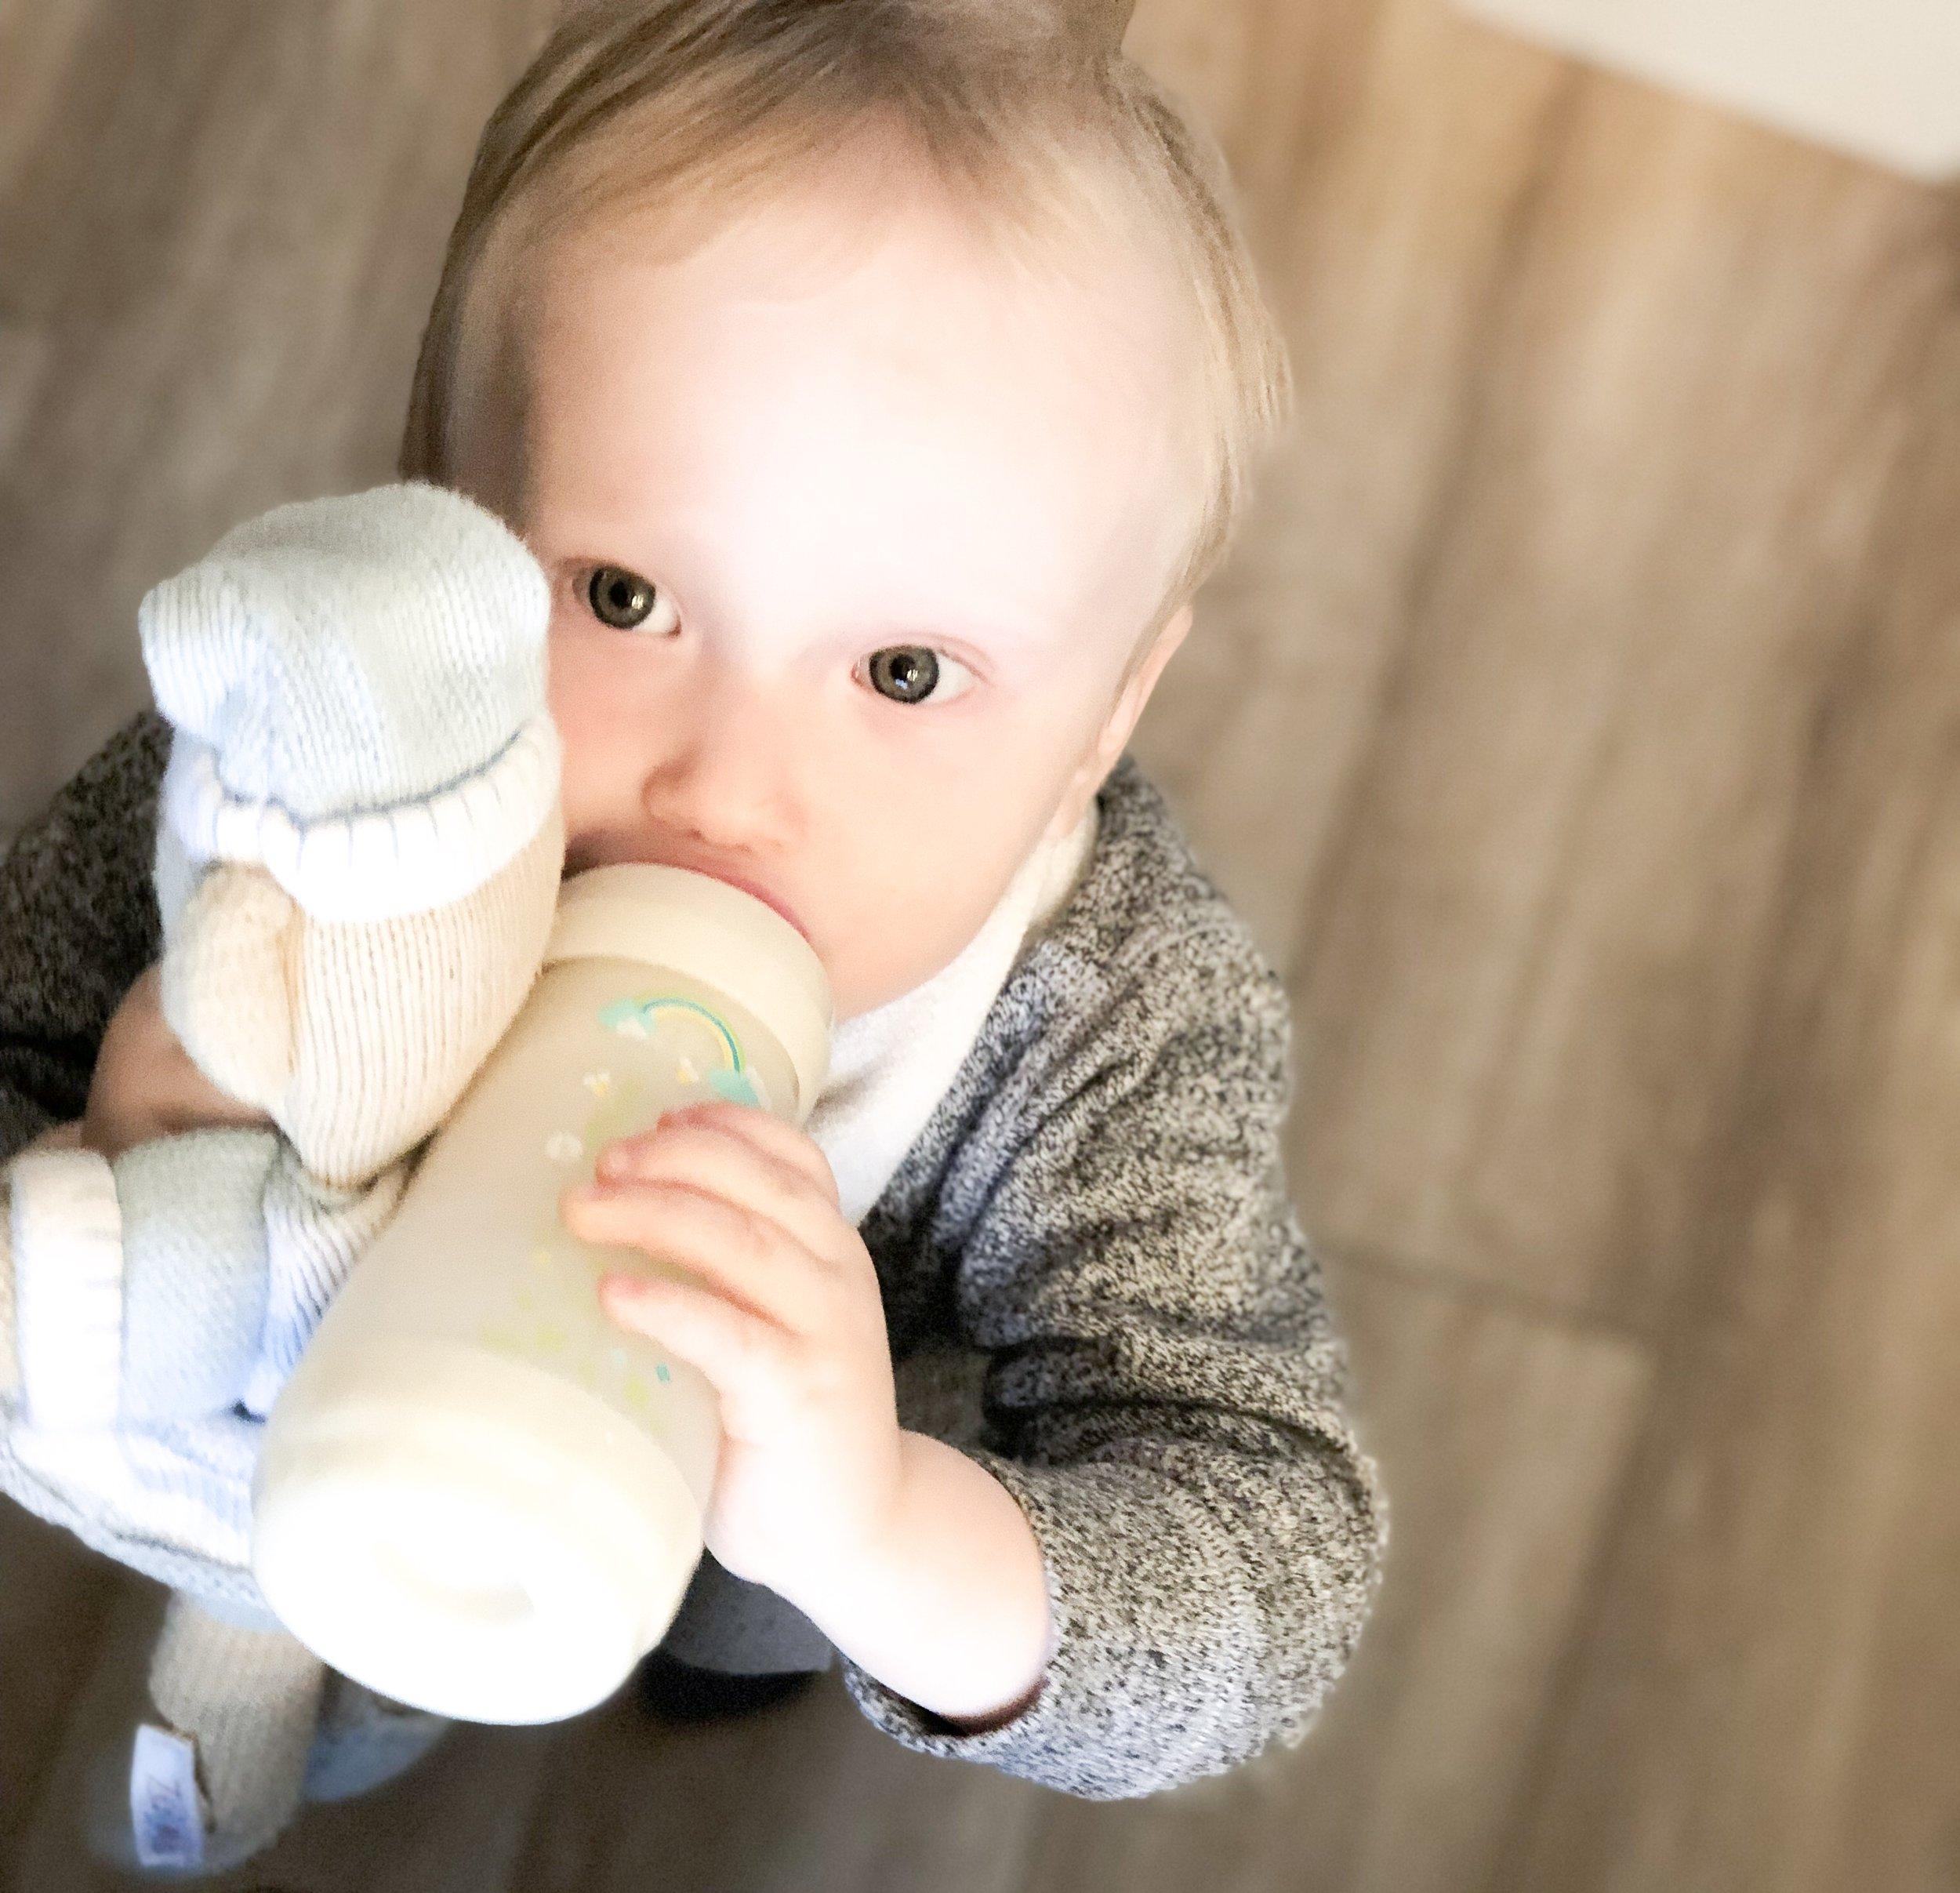 Millennial Motherhood - MAM Anti-Colic Baby Bottles